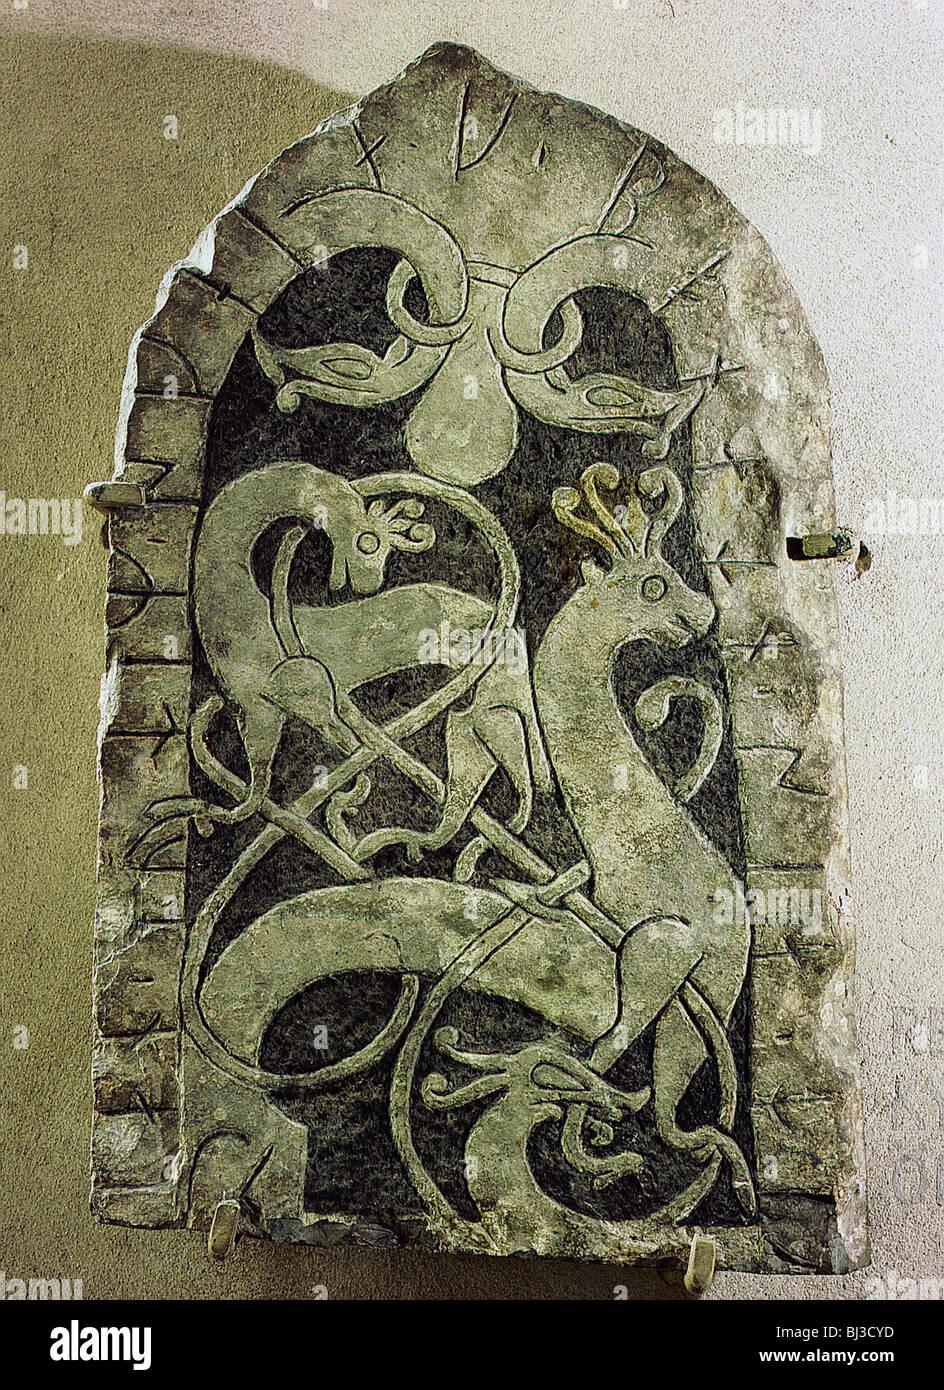 Picture stone, pre-Viking, Gotland, Sweden. Artist: Werner Forman - Stock Image